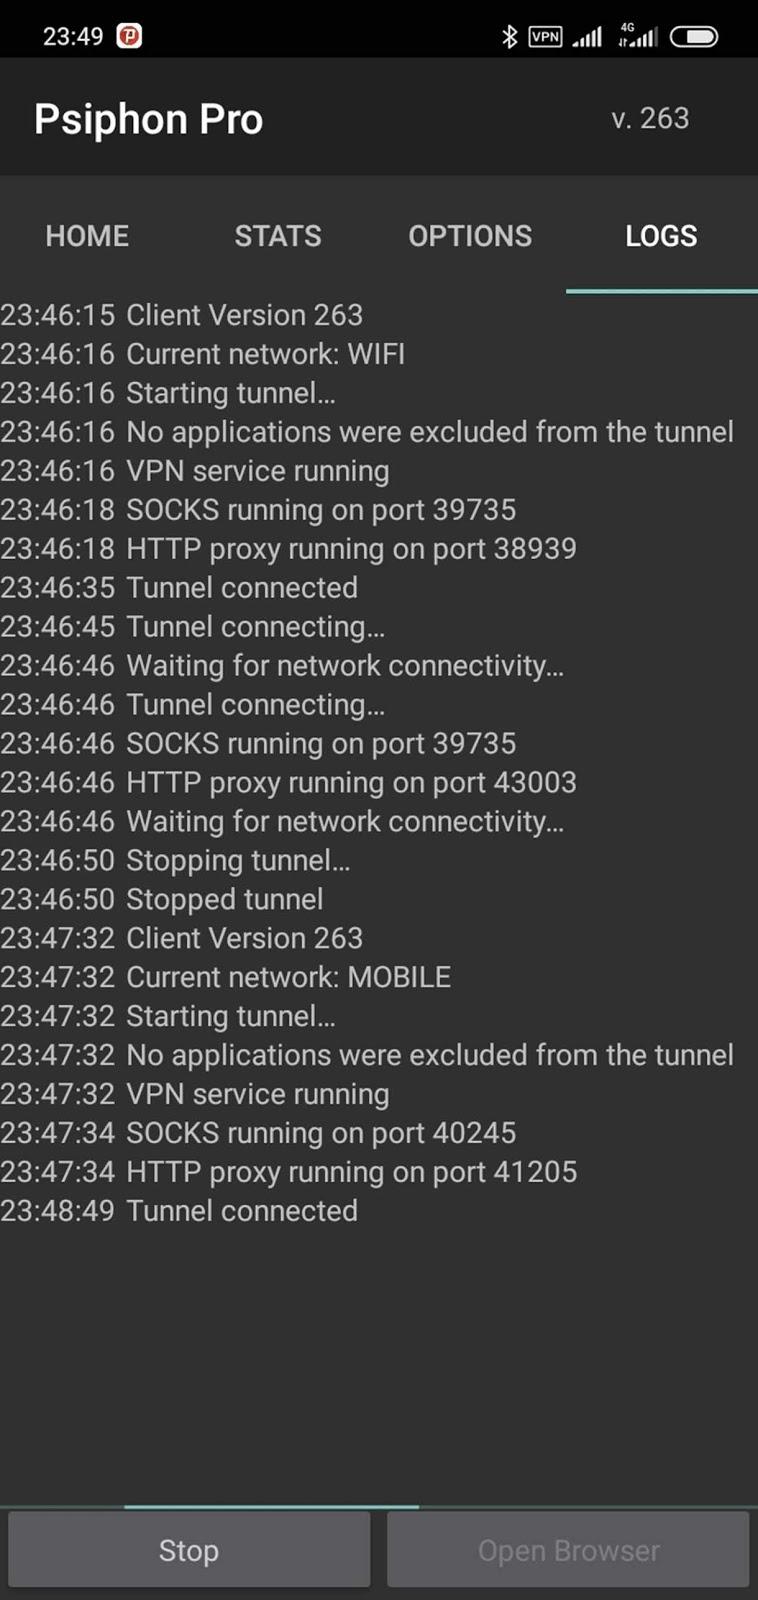 Psiphon 4G Free Internet for Safaricom Kenya